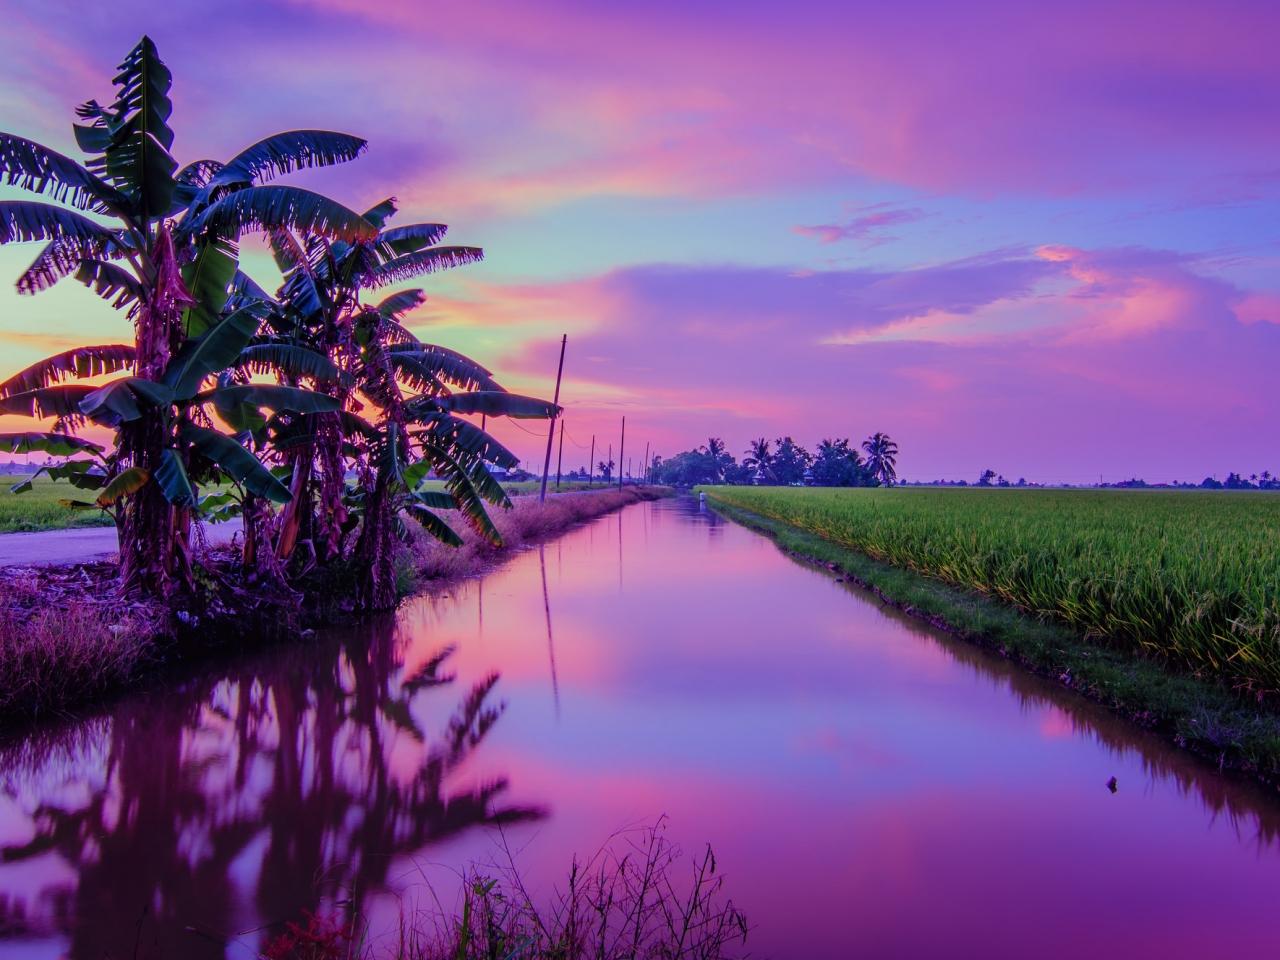 Puesta de Sol color Púrpura - 1280x960